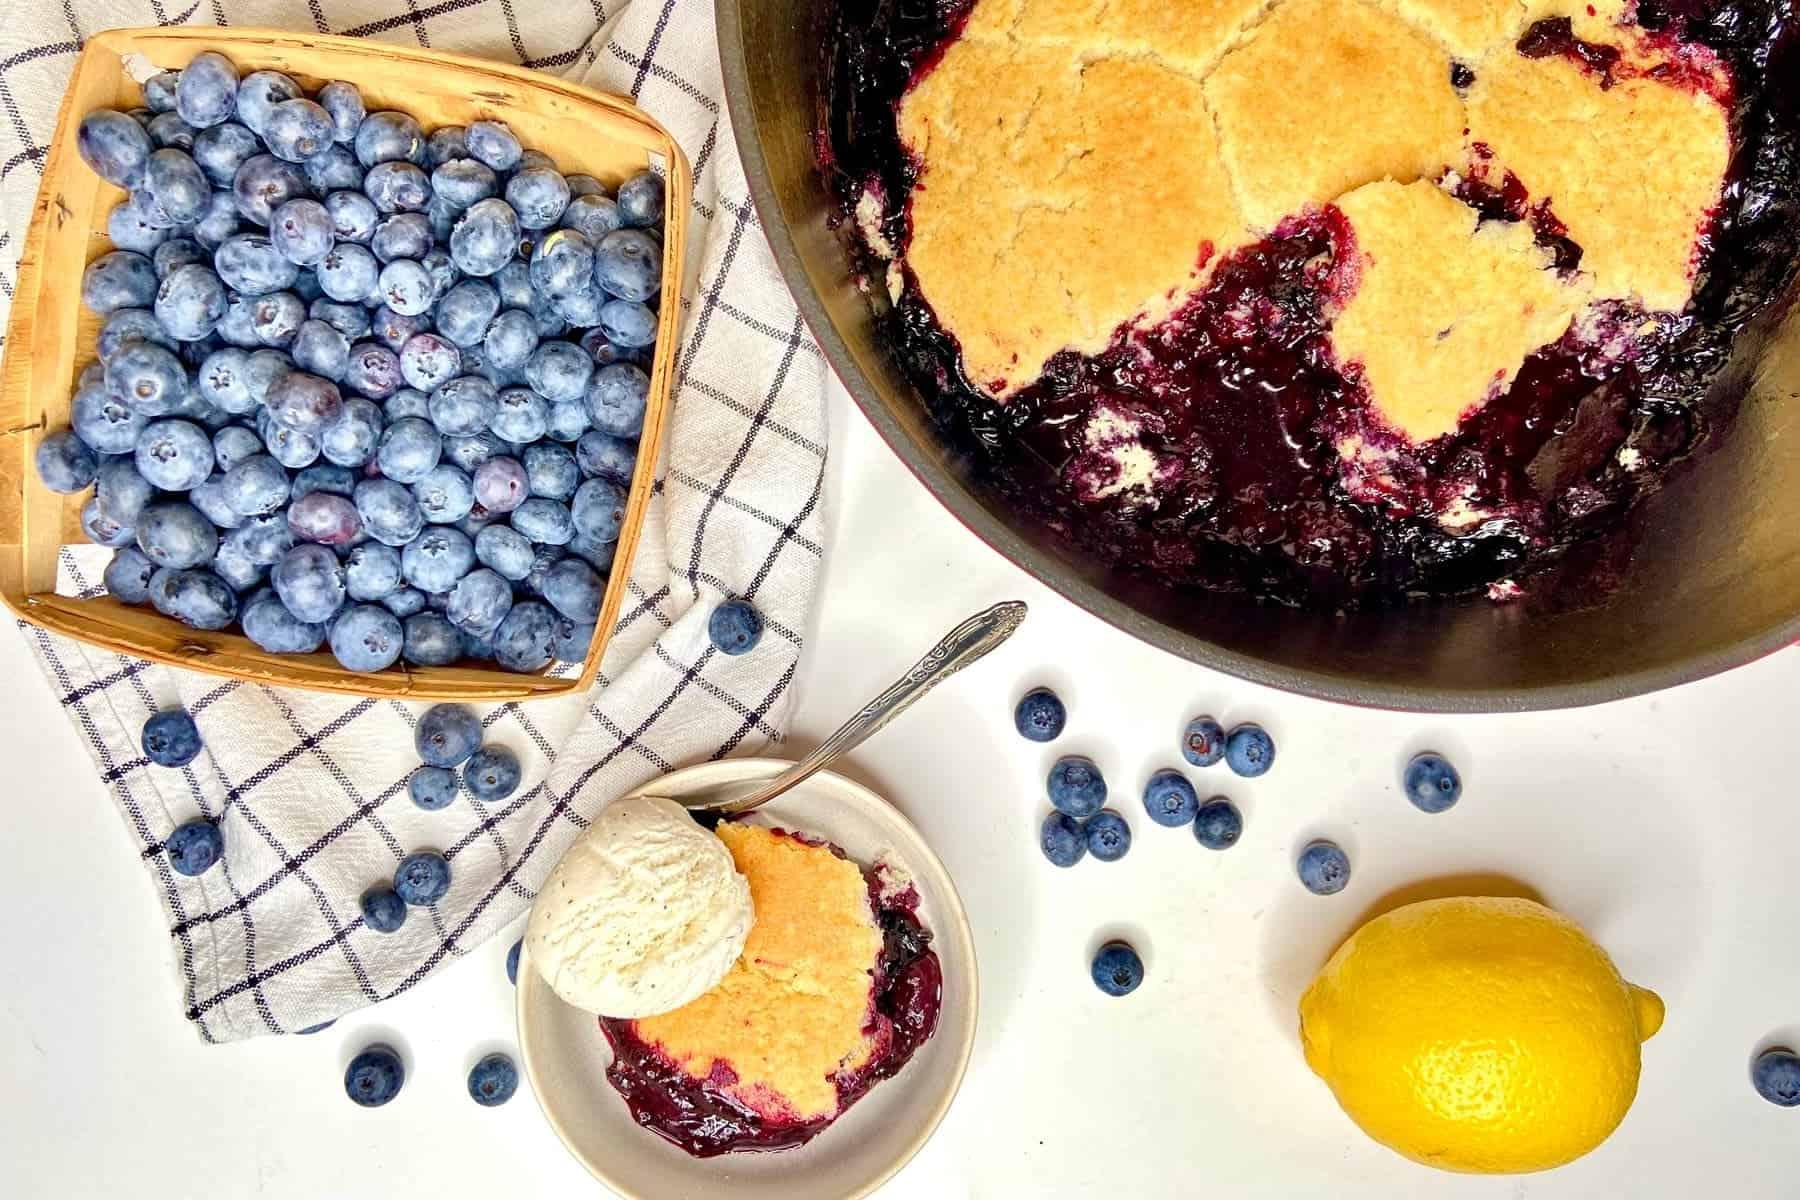 Dutch Oven Blueberry Cobbler (Photo by Viana Boenzli)